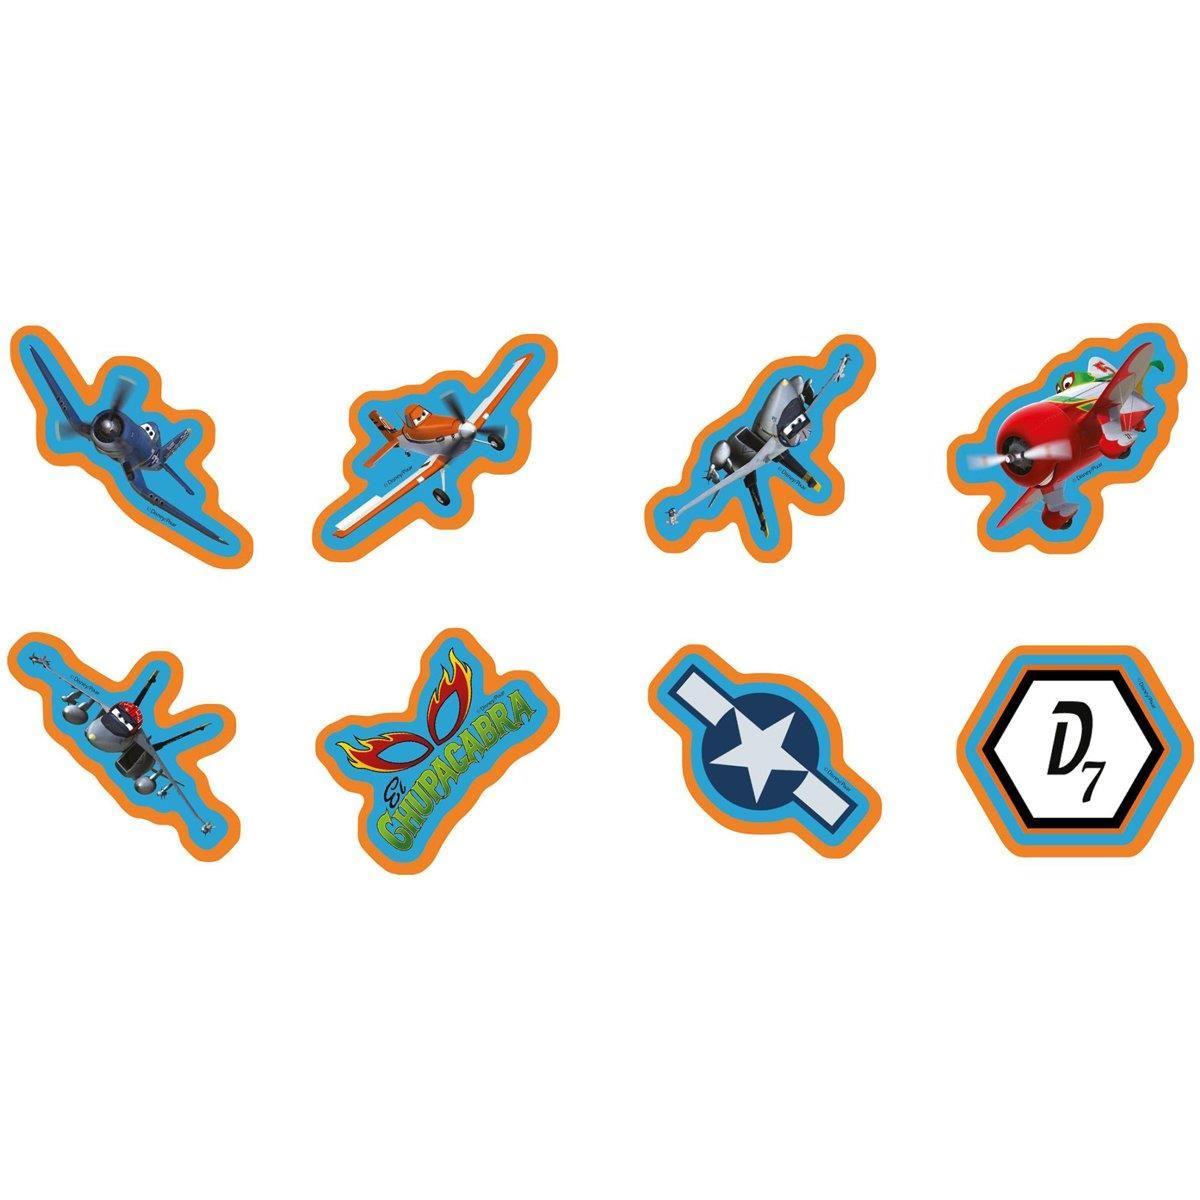 Disney Planes 8 Piece Card Decor imagine